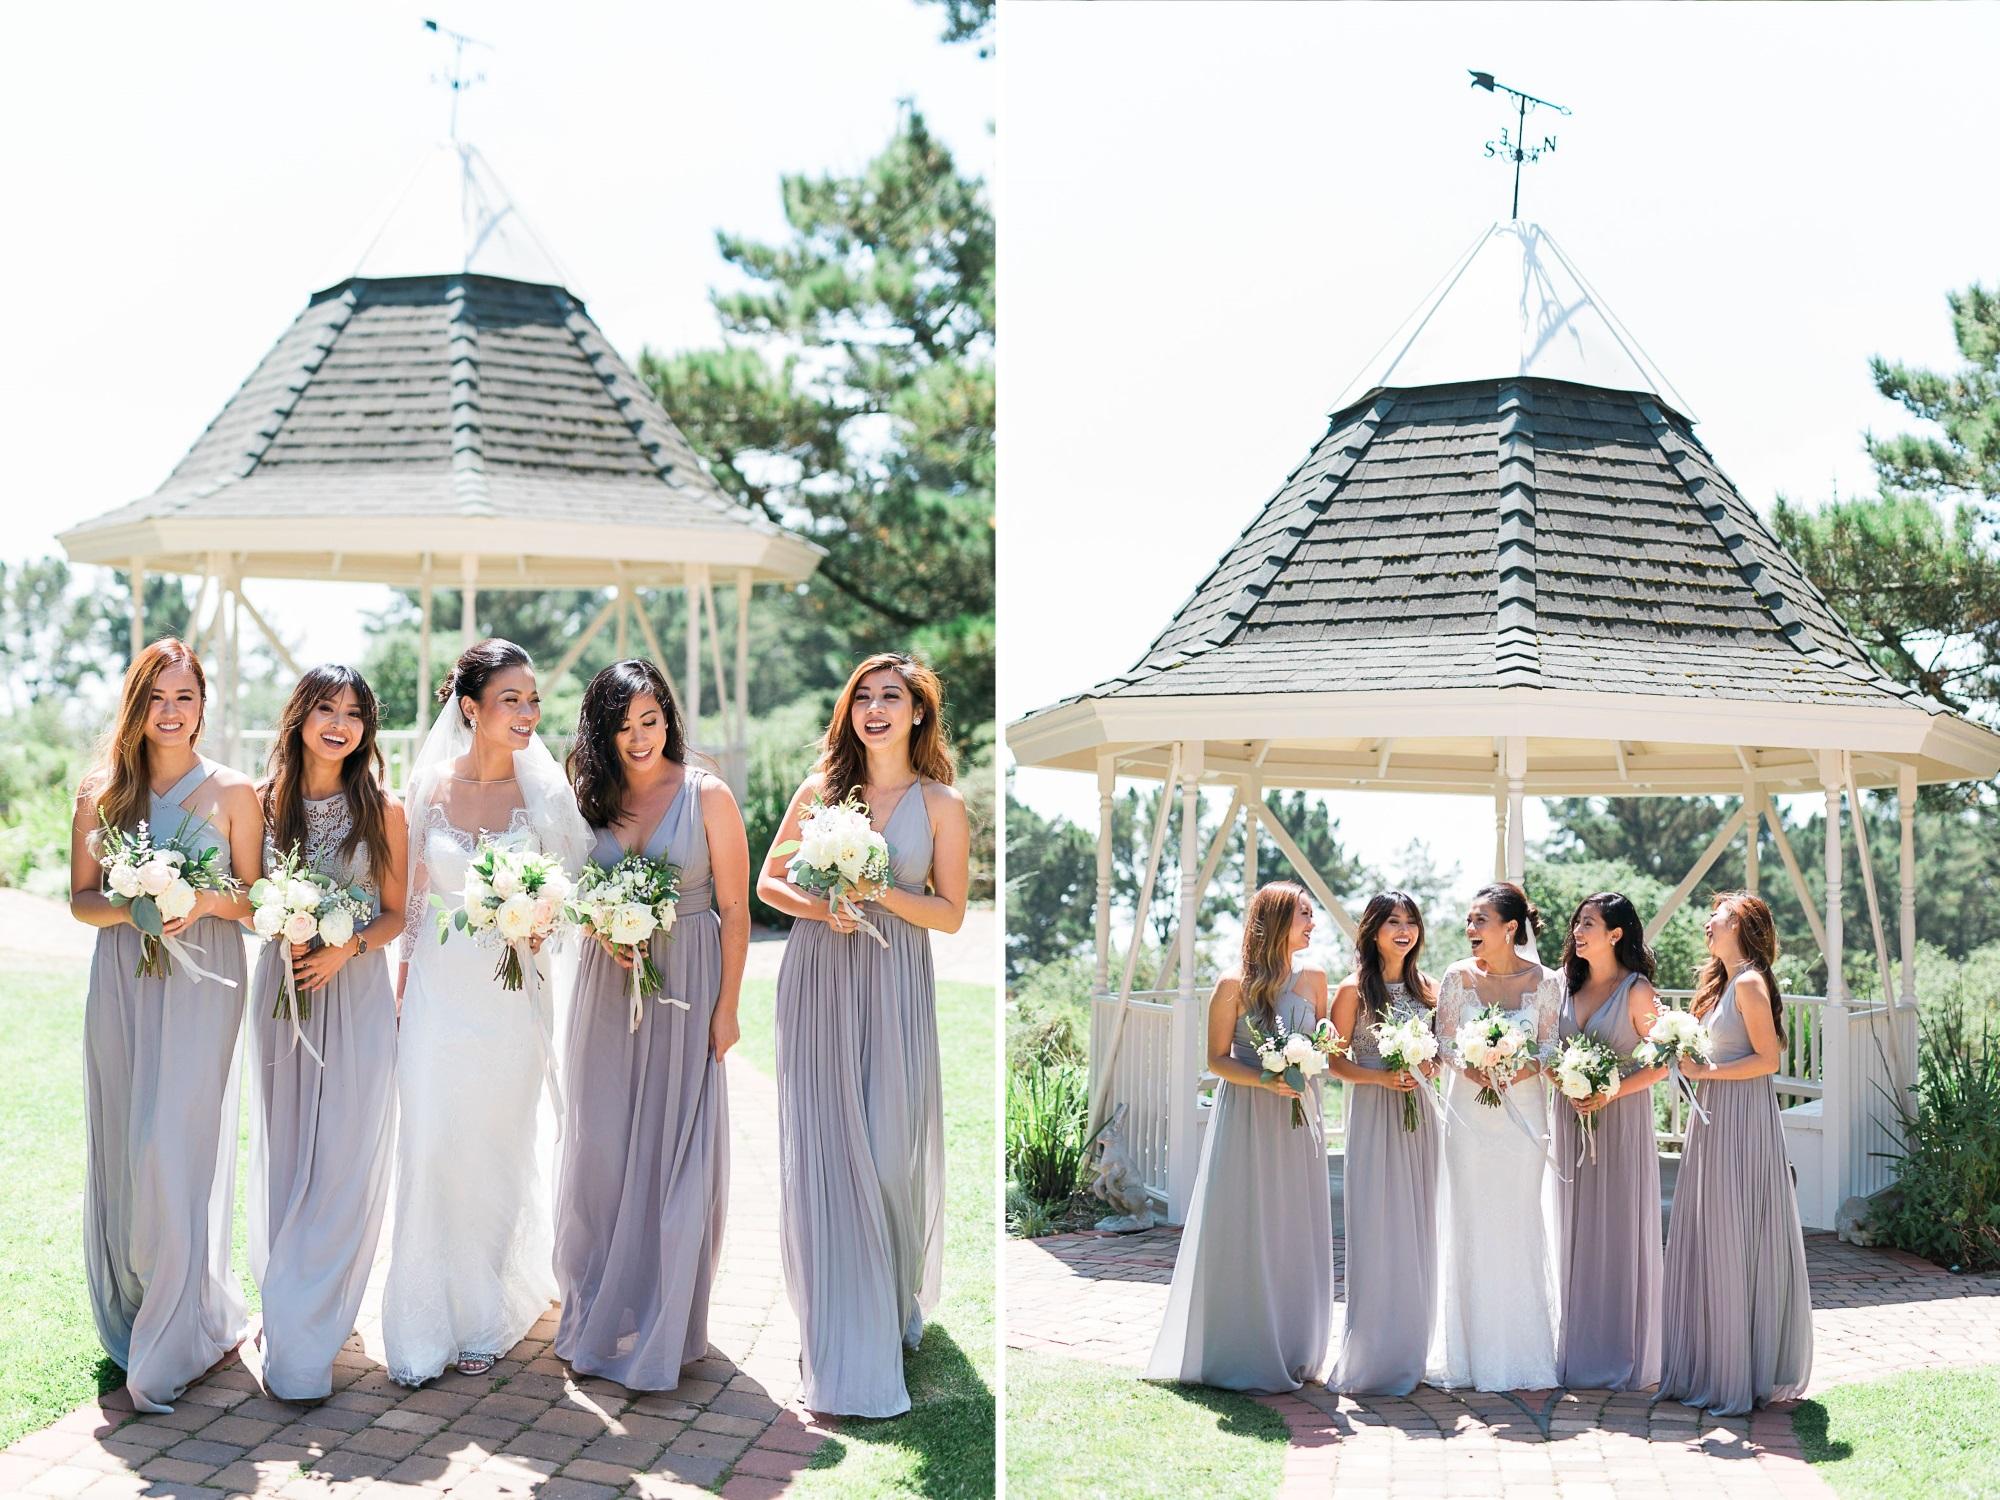 Wedding at Preservation Park in Oakland - Preservation Park Wedding Photos by JBJ Pictures San Francisco Photographer (32).jpg